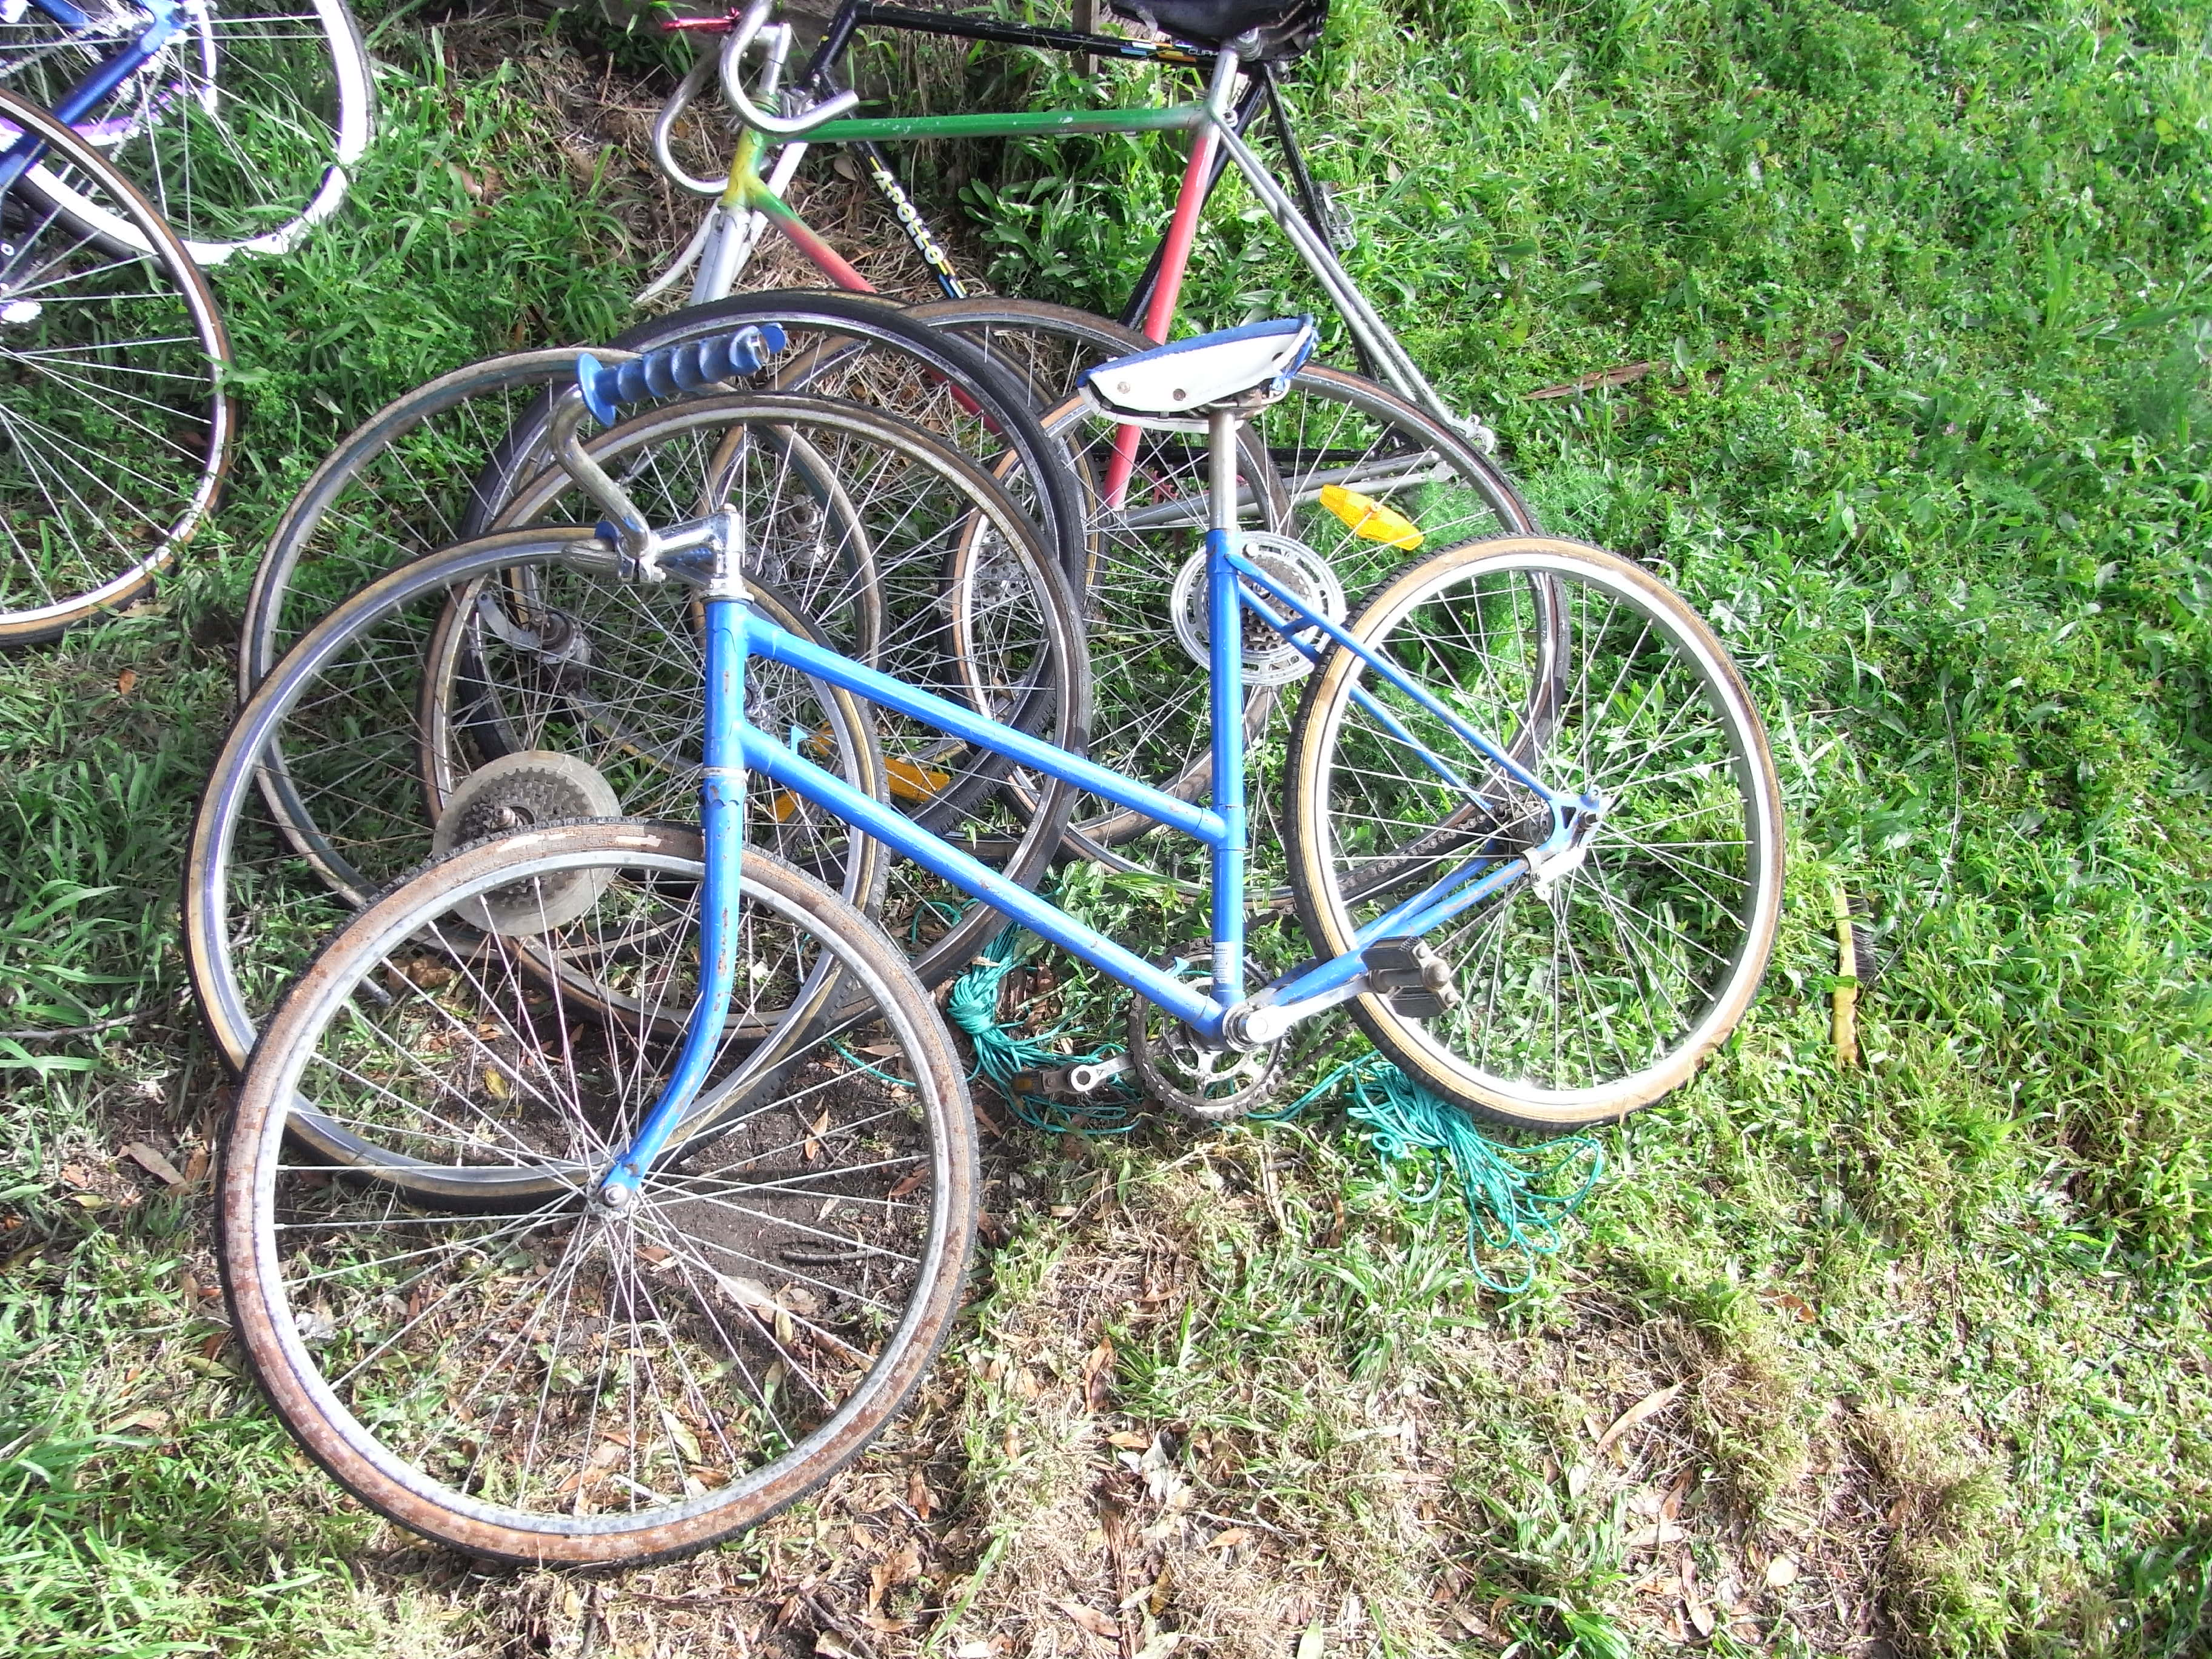 blue bike and some frames.